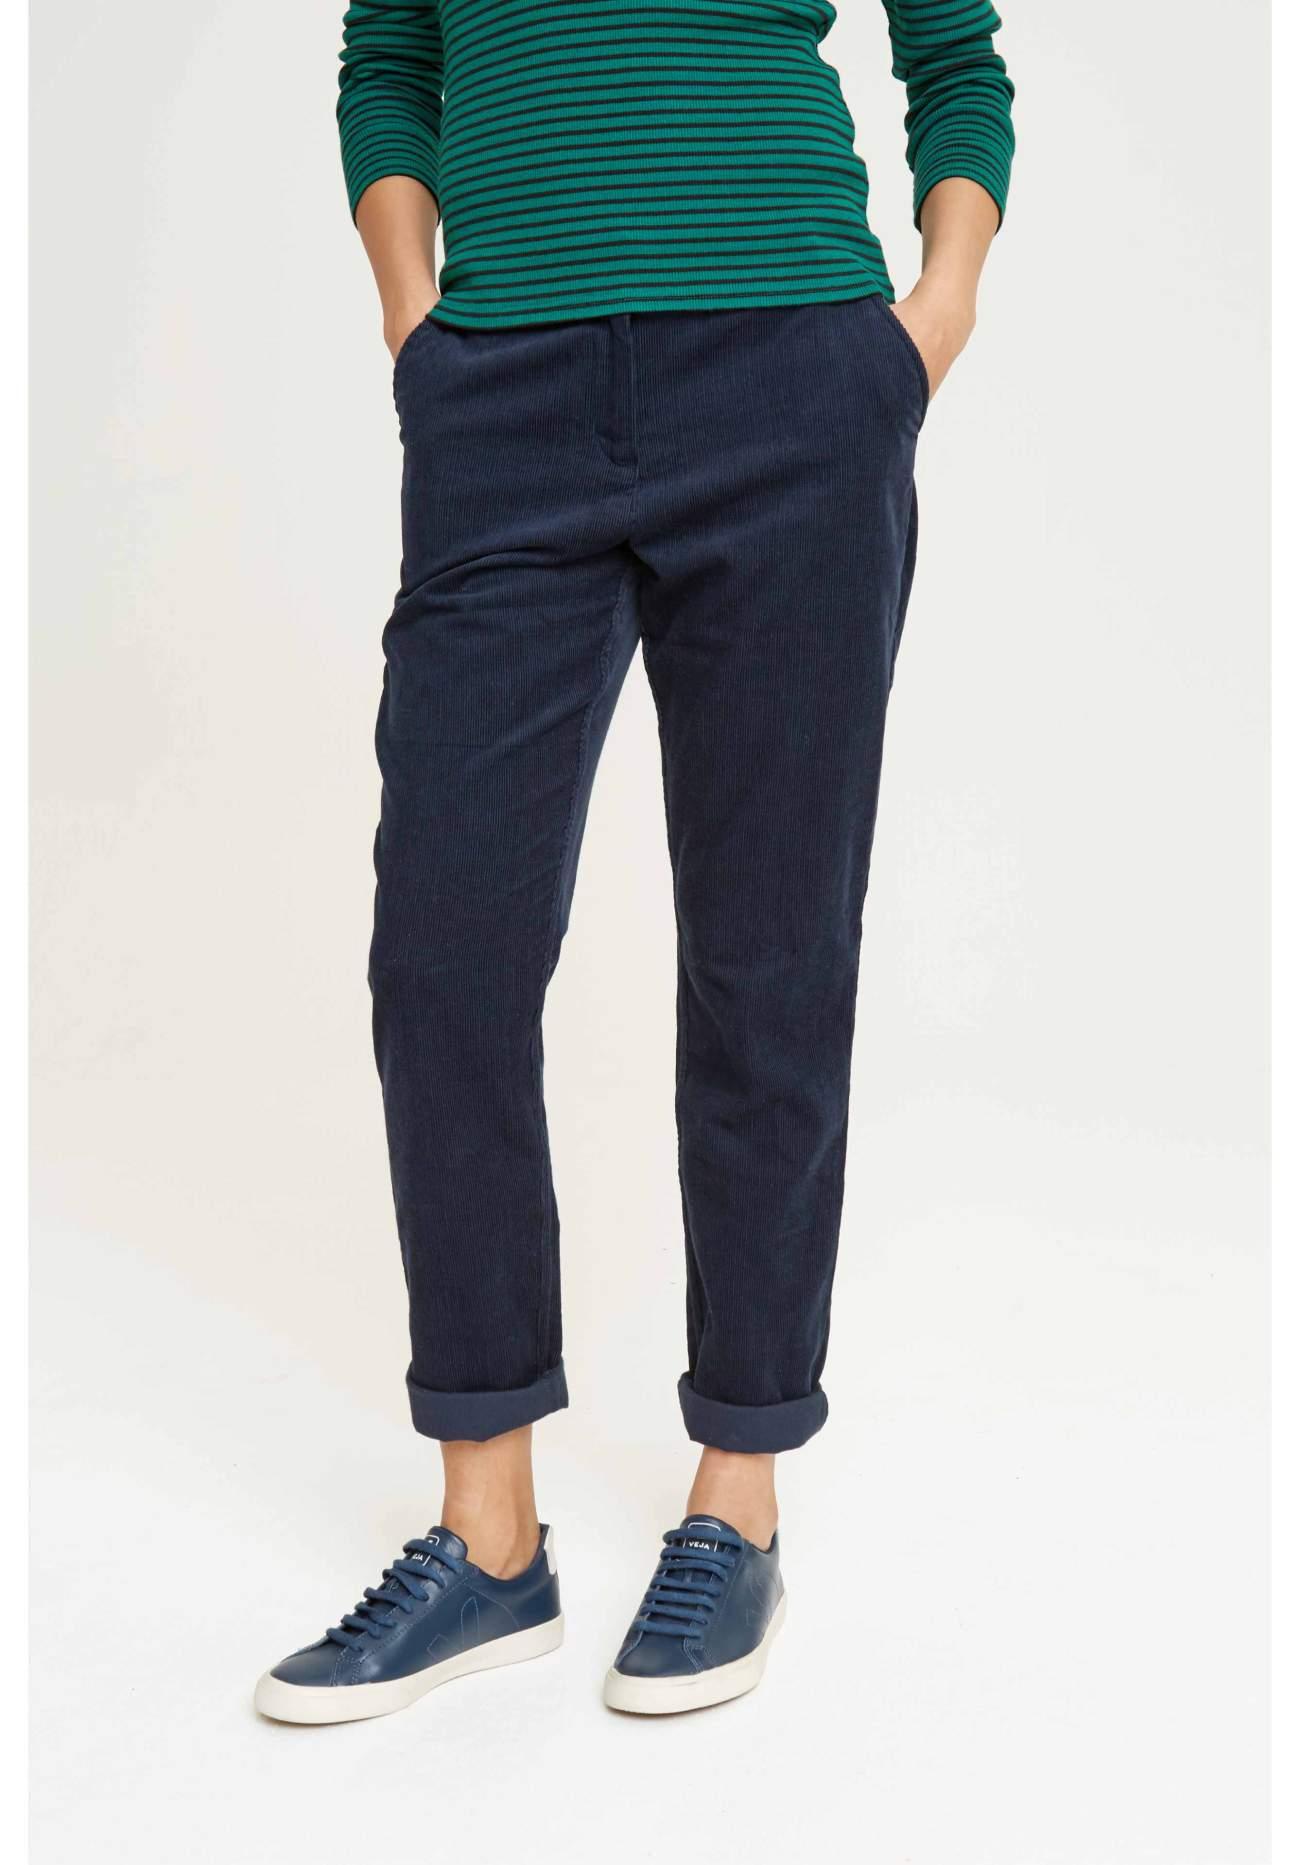 kana-corduroy-trousers-navy-1fcf2cf43c2a